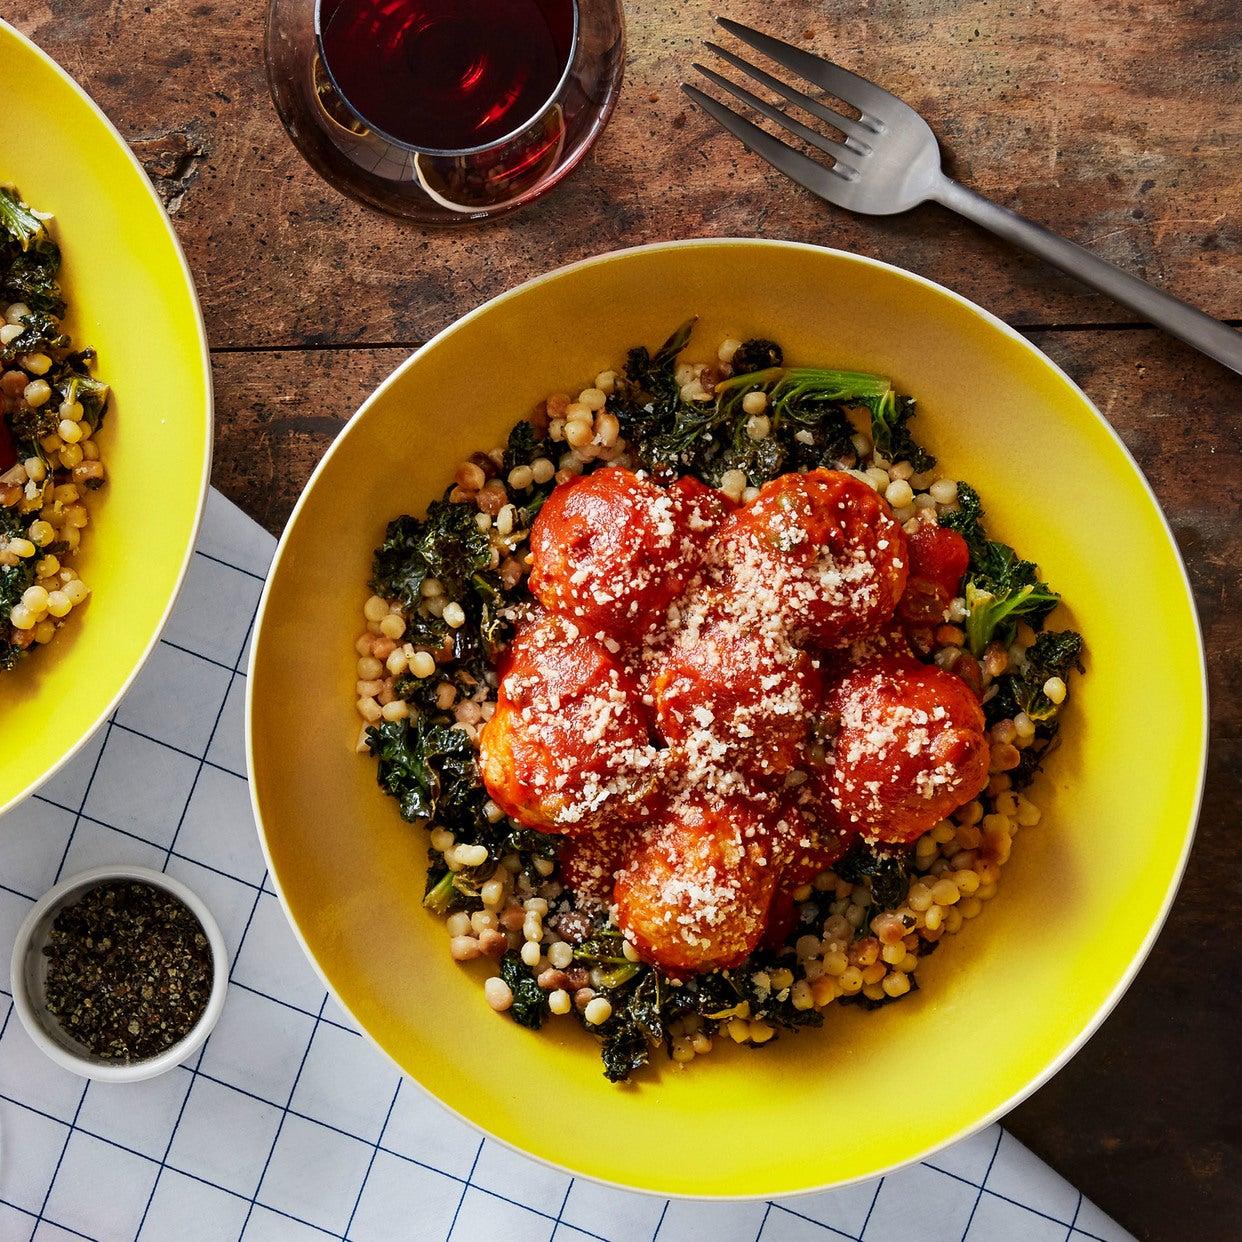 Chicken Meatballs & Fregola Sarda with Kale & Sicilian Tomato Sauce